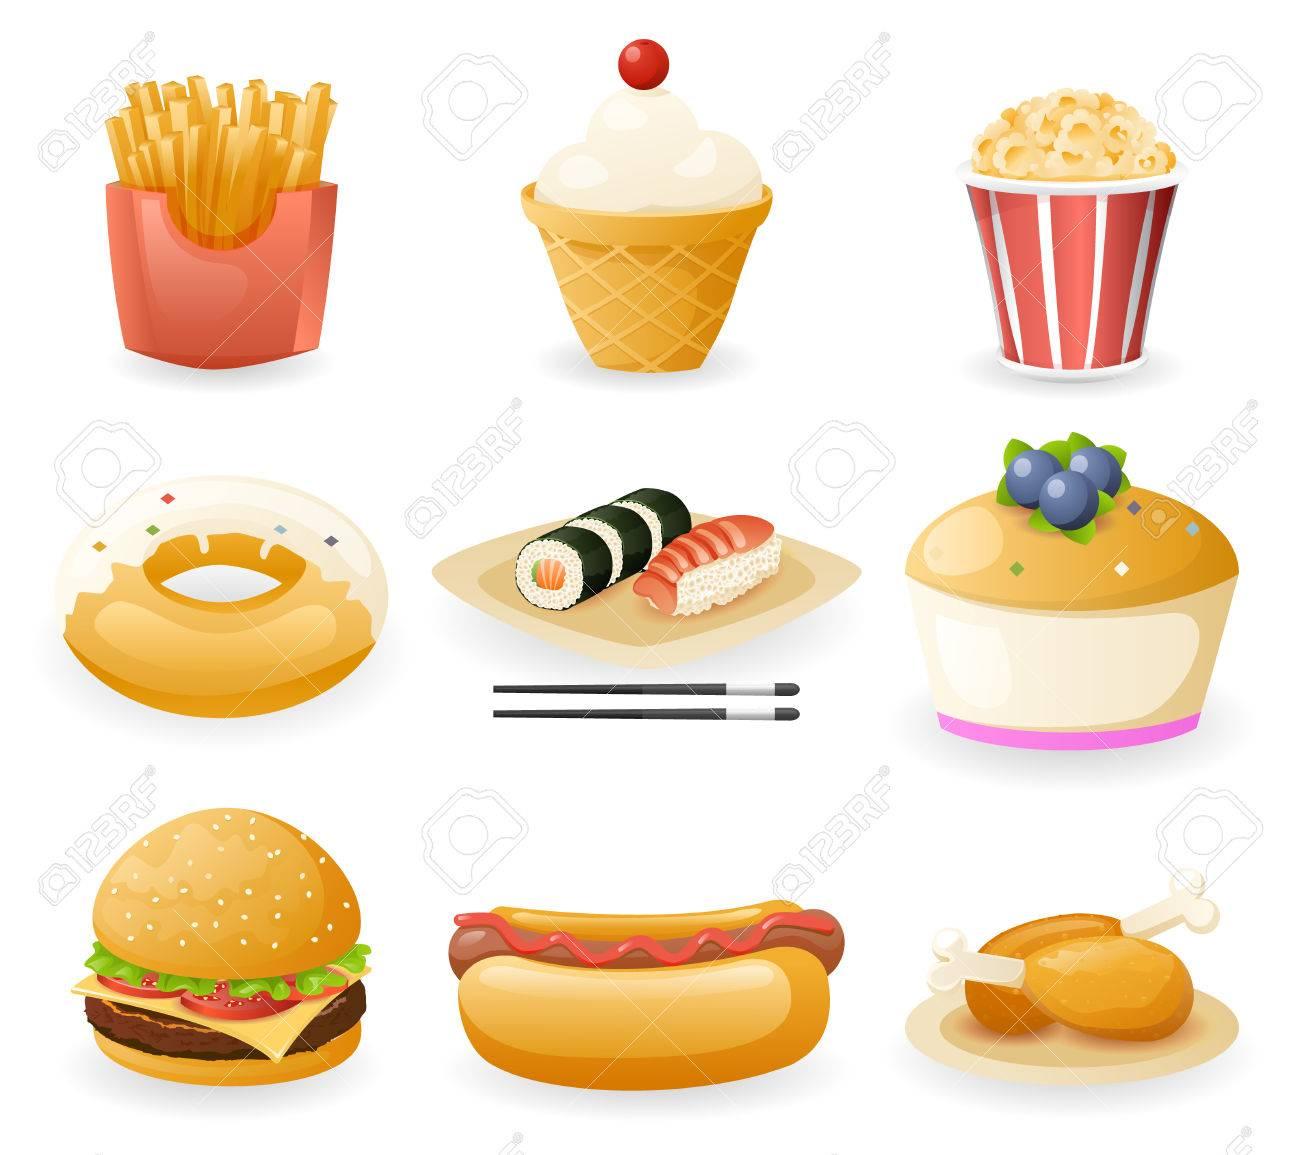 Retro Flat Fast Food Icons And Symbols Set Vector Illustration